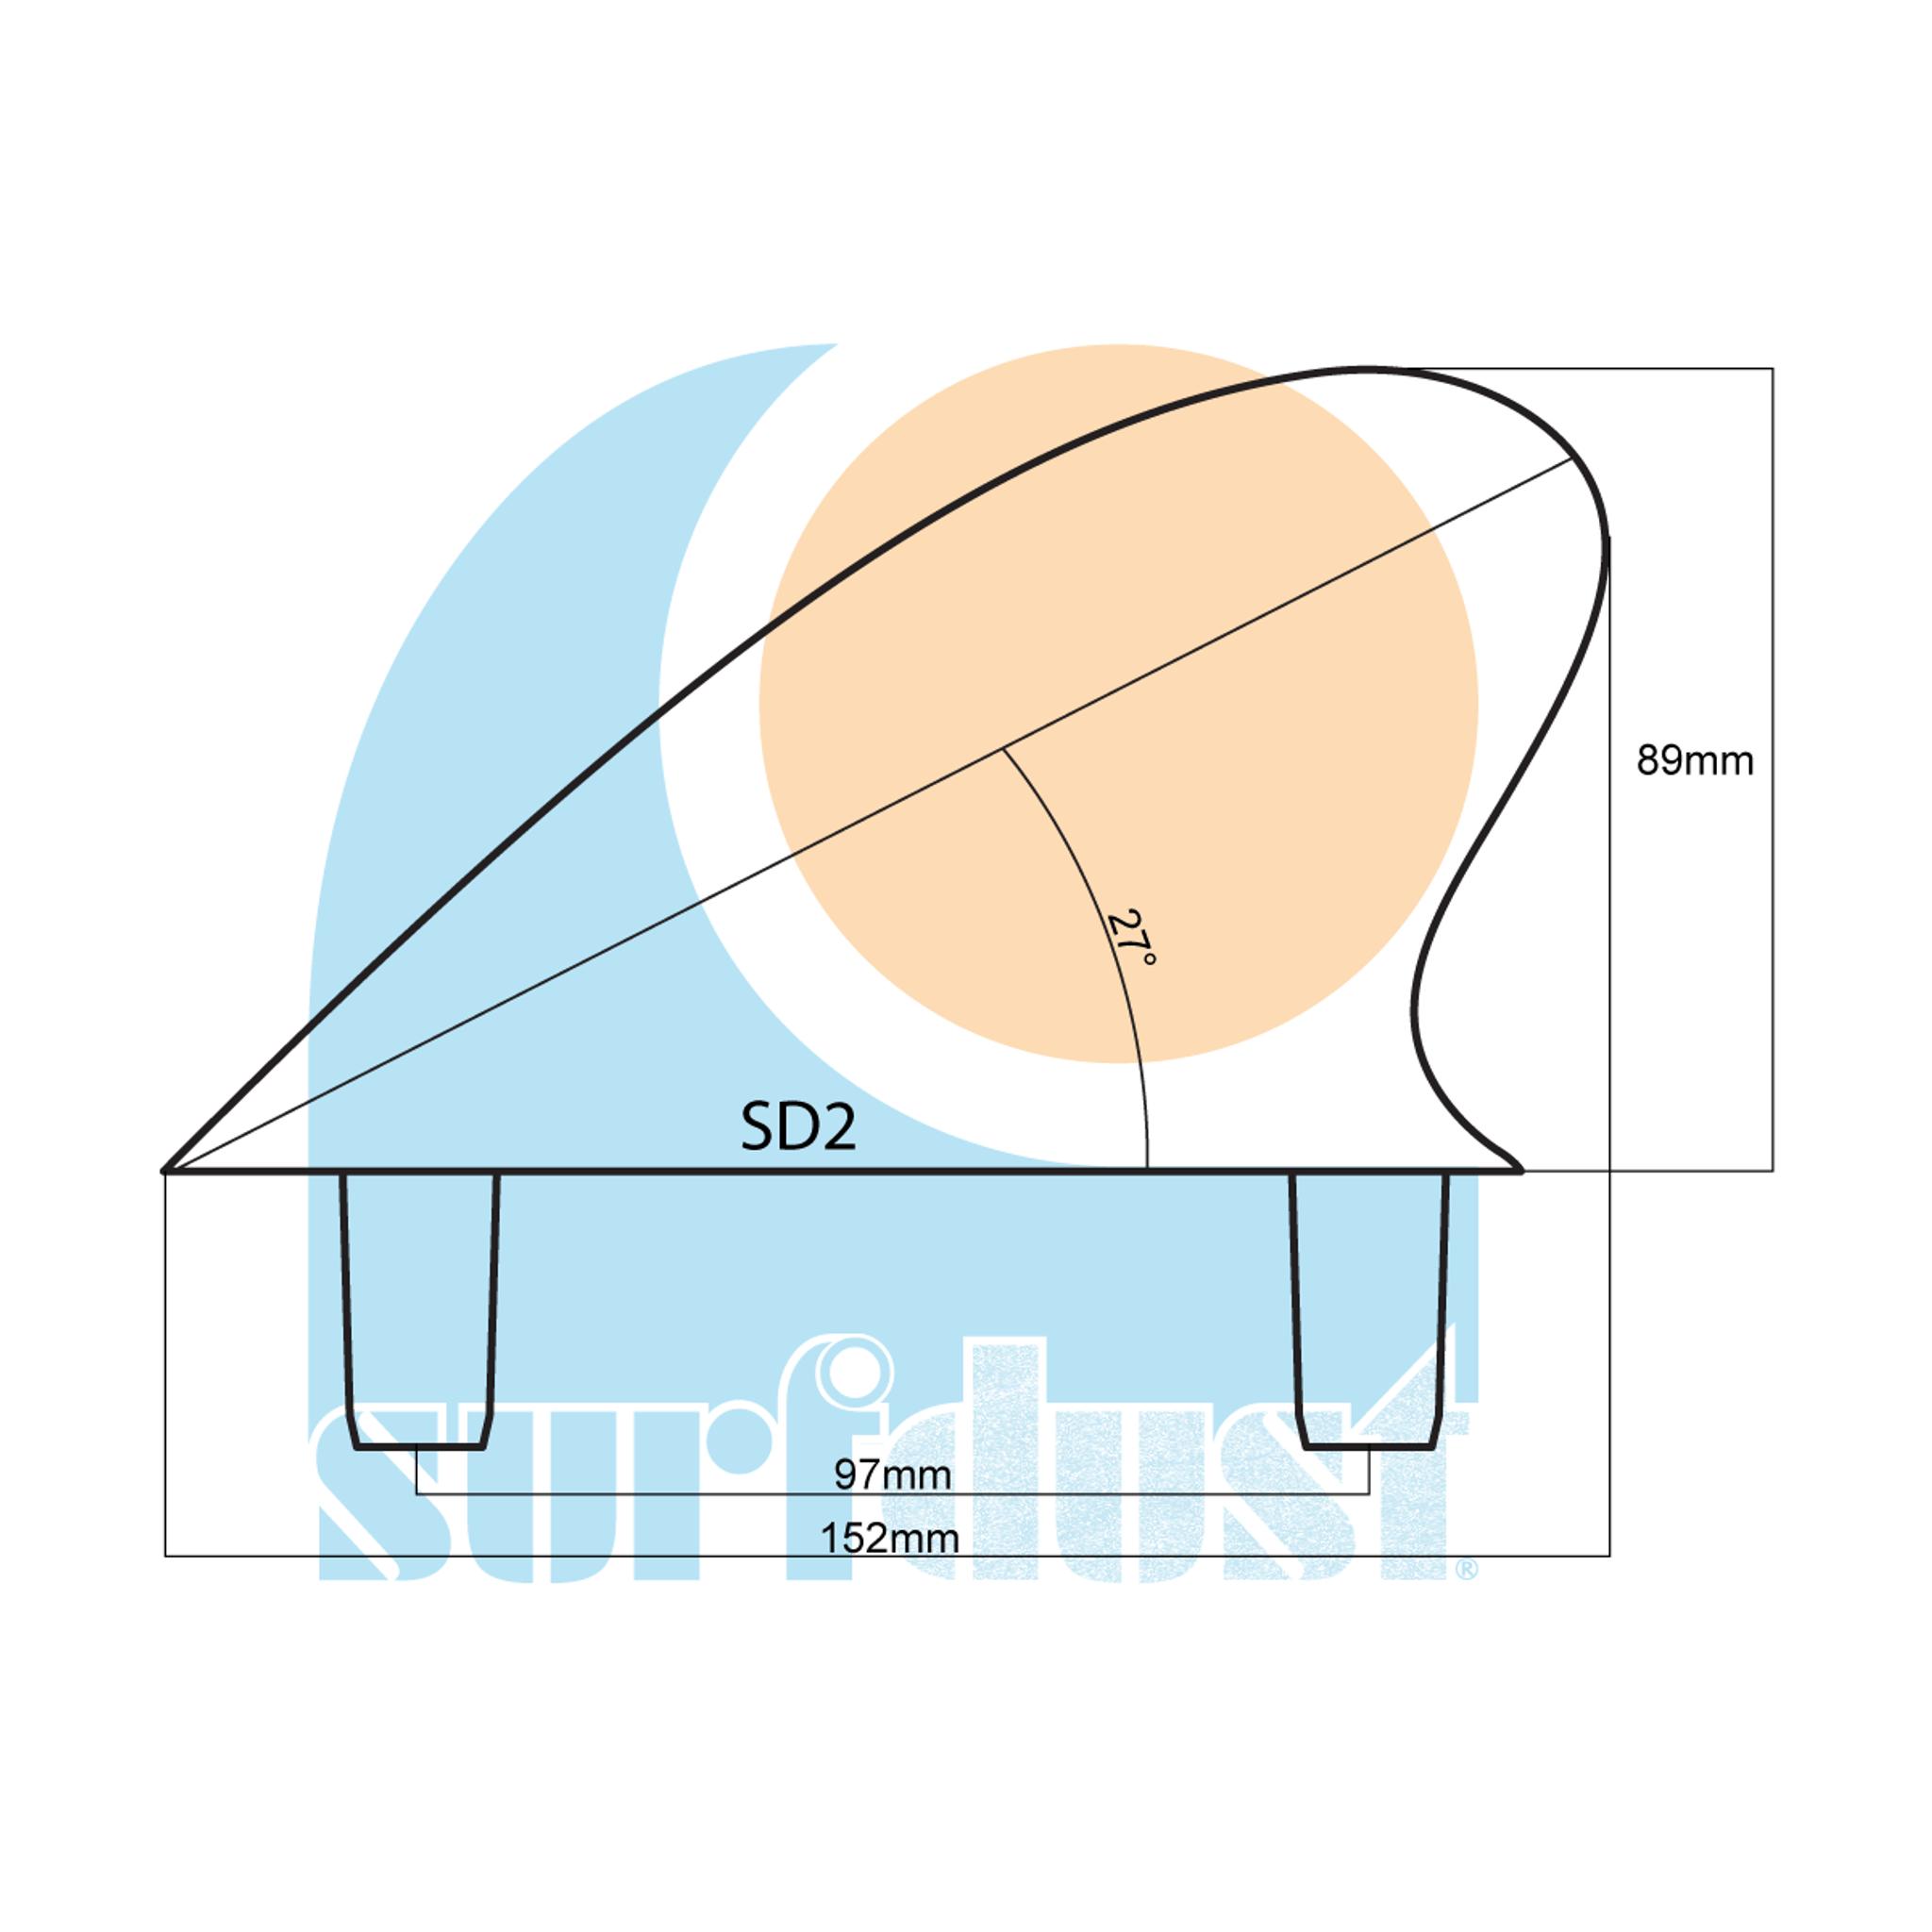 SURFDUST Fins SD2 Size Details